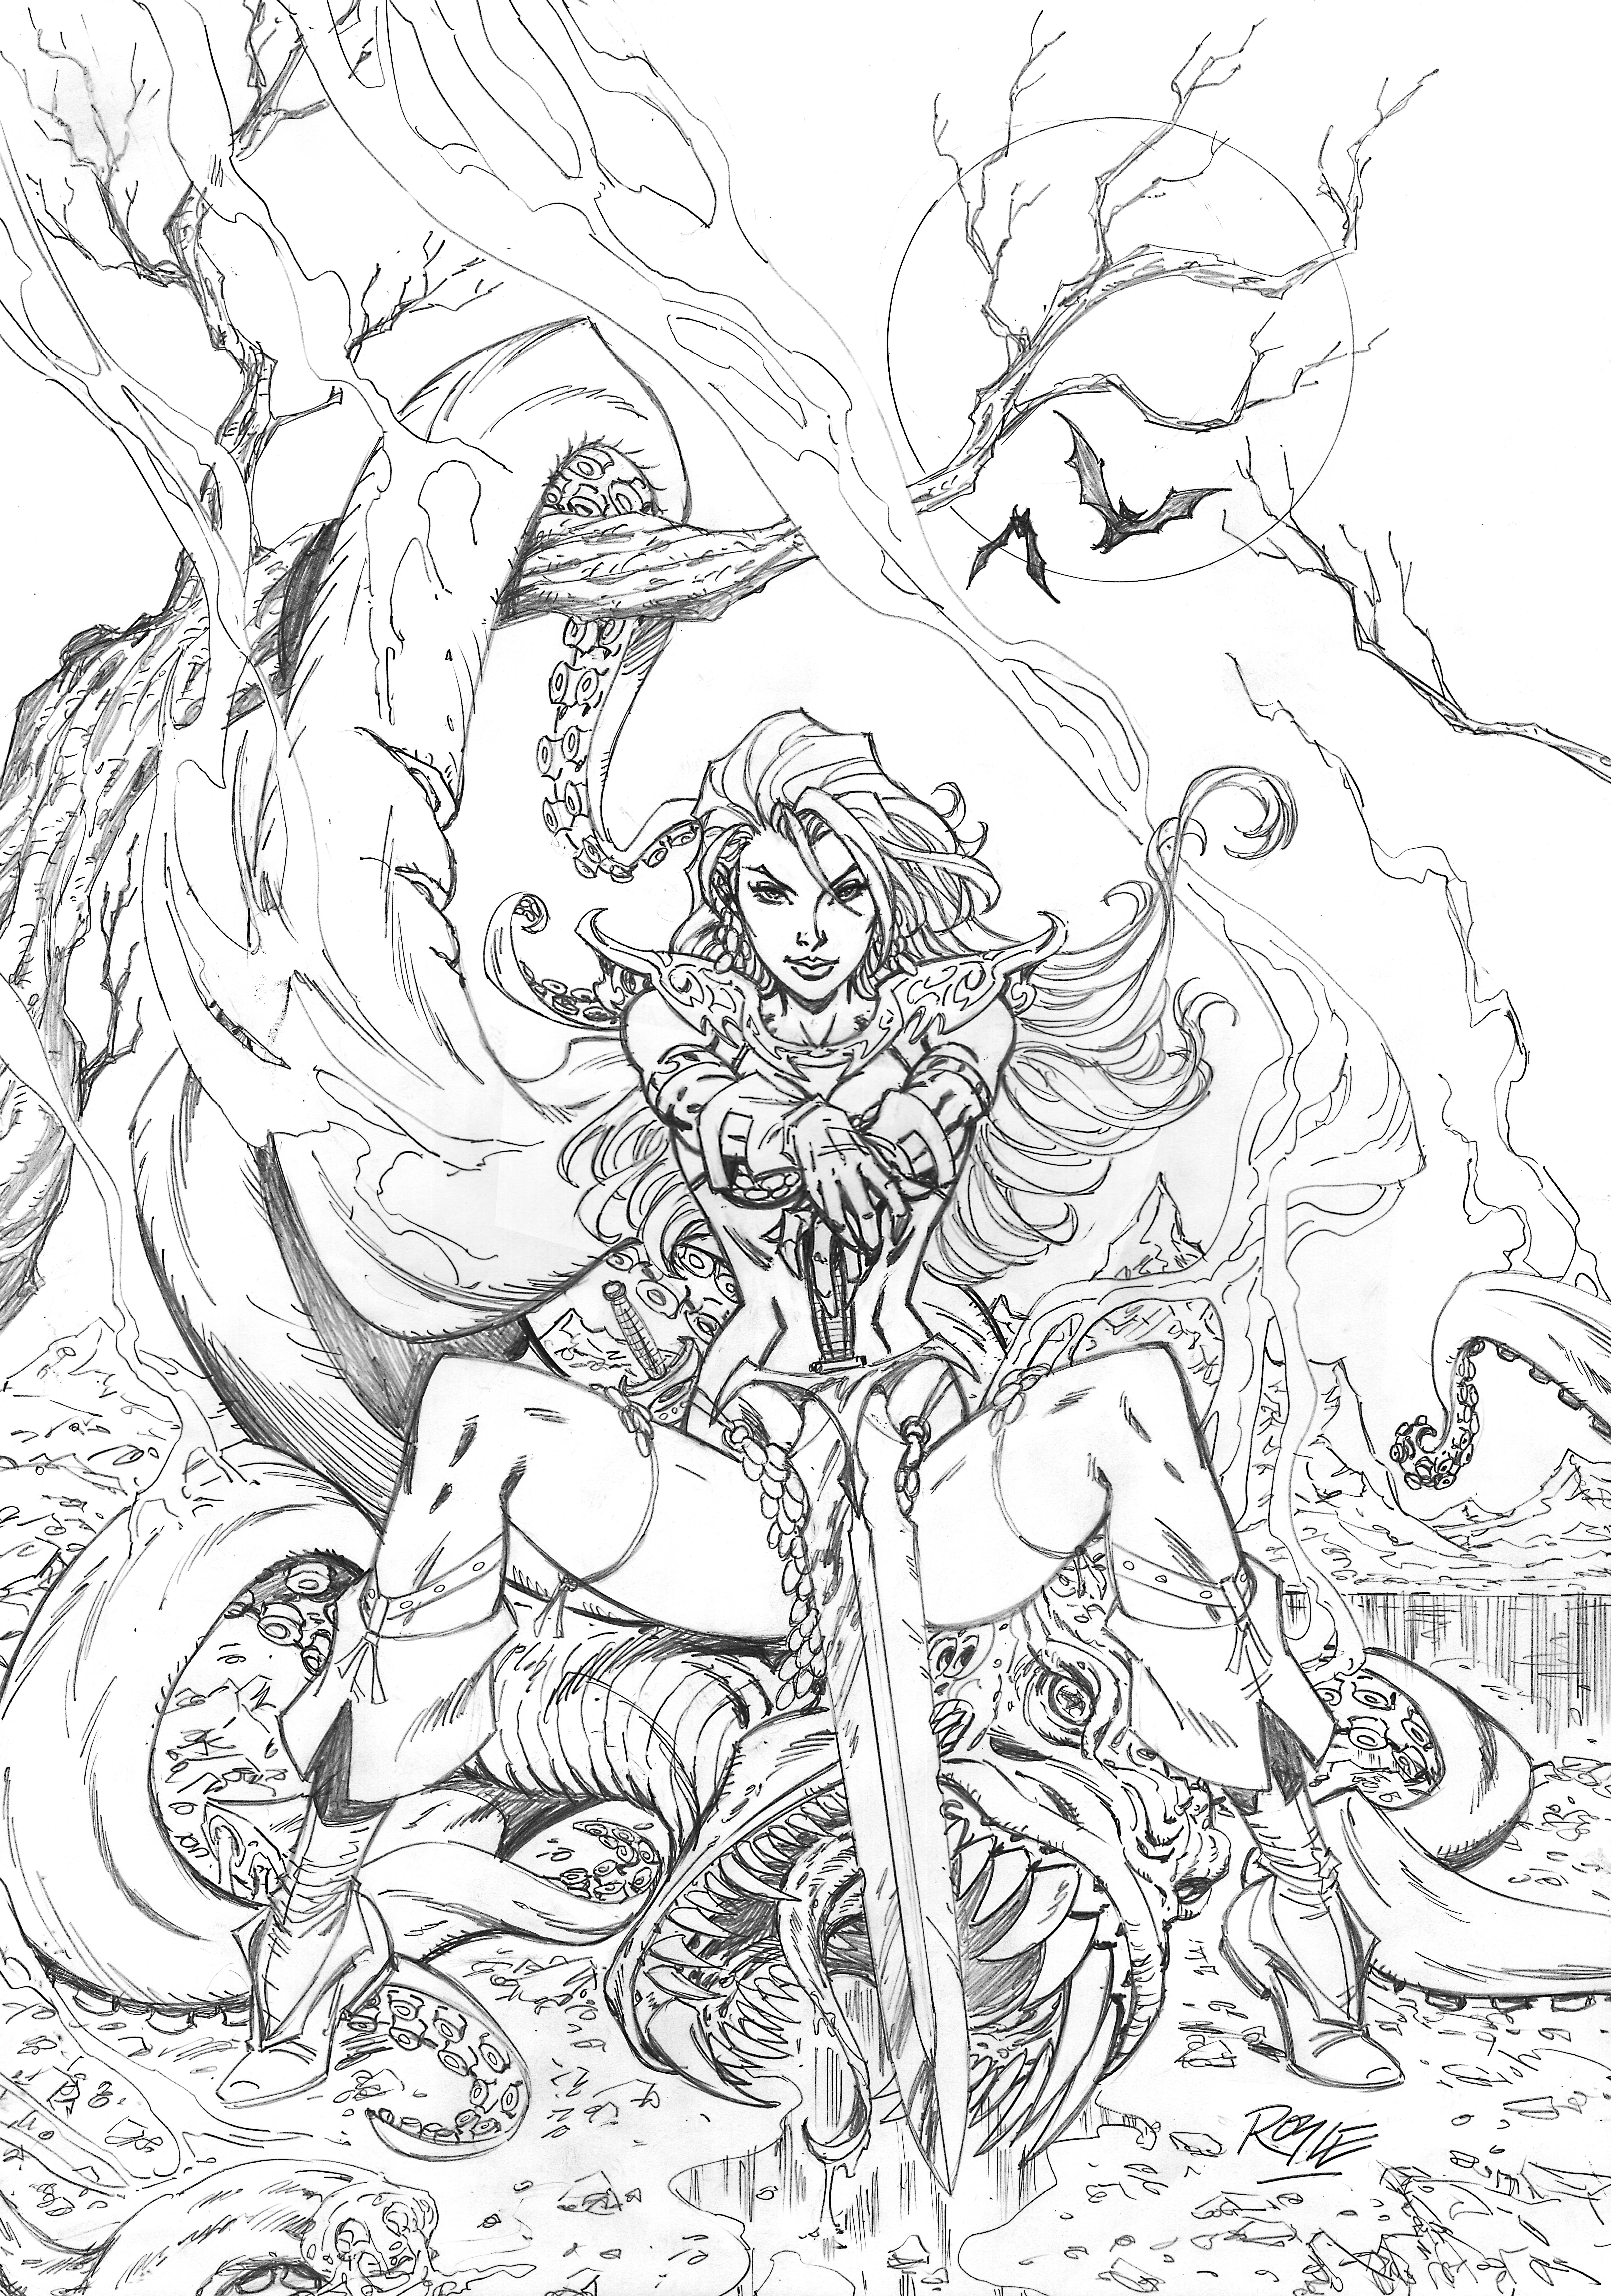 Red Sonja # 21